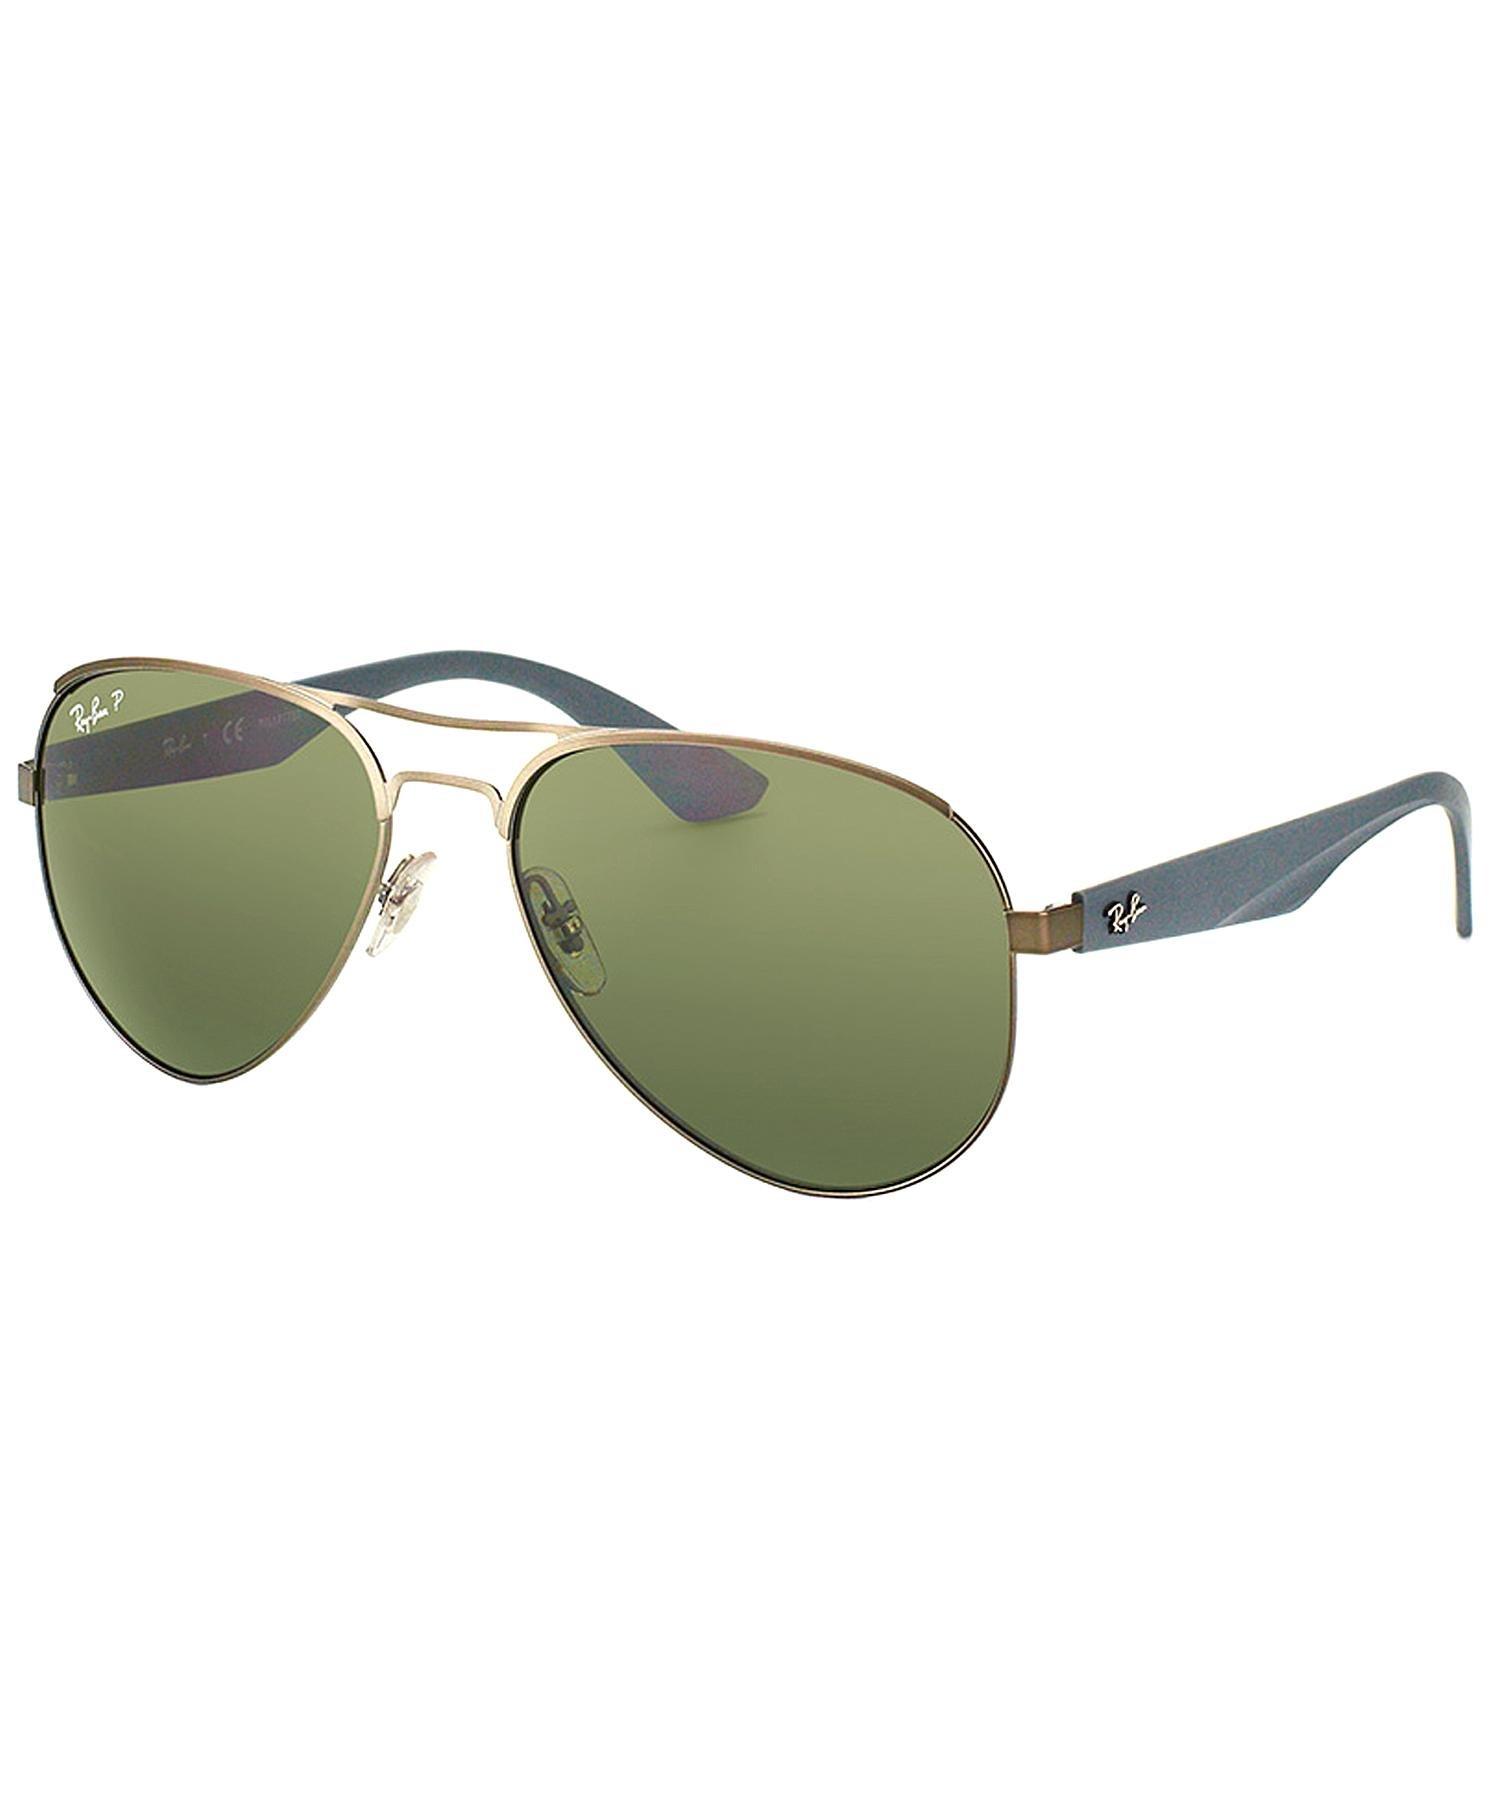 678c82a30e8 Ray Ban Original Aviator Sunglasses Gunmetal Polarized Green ...